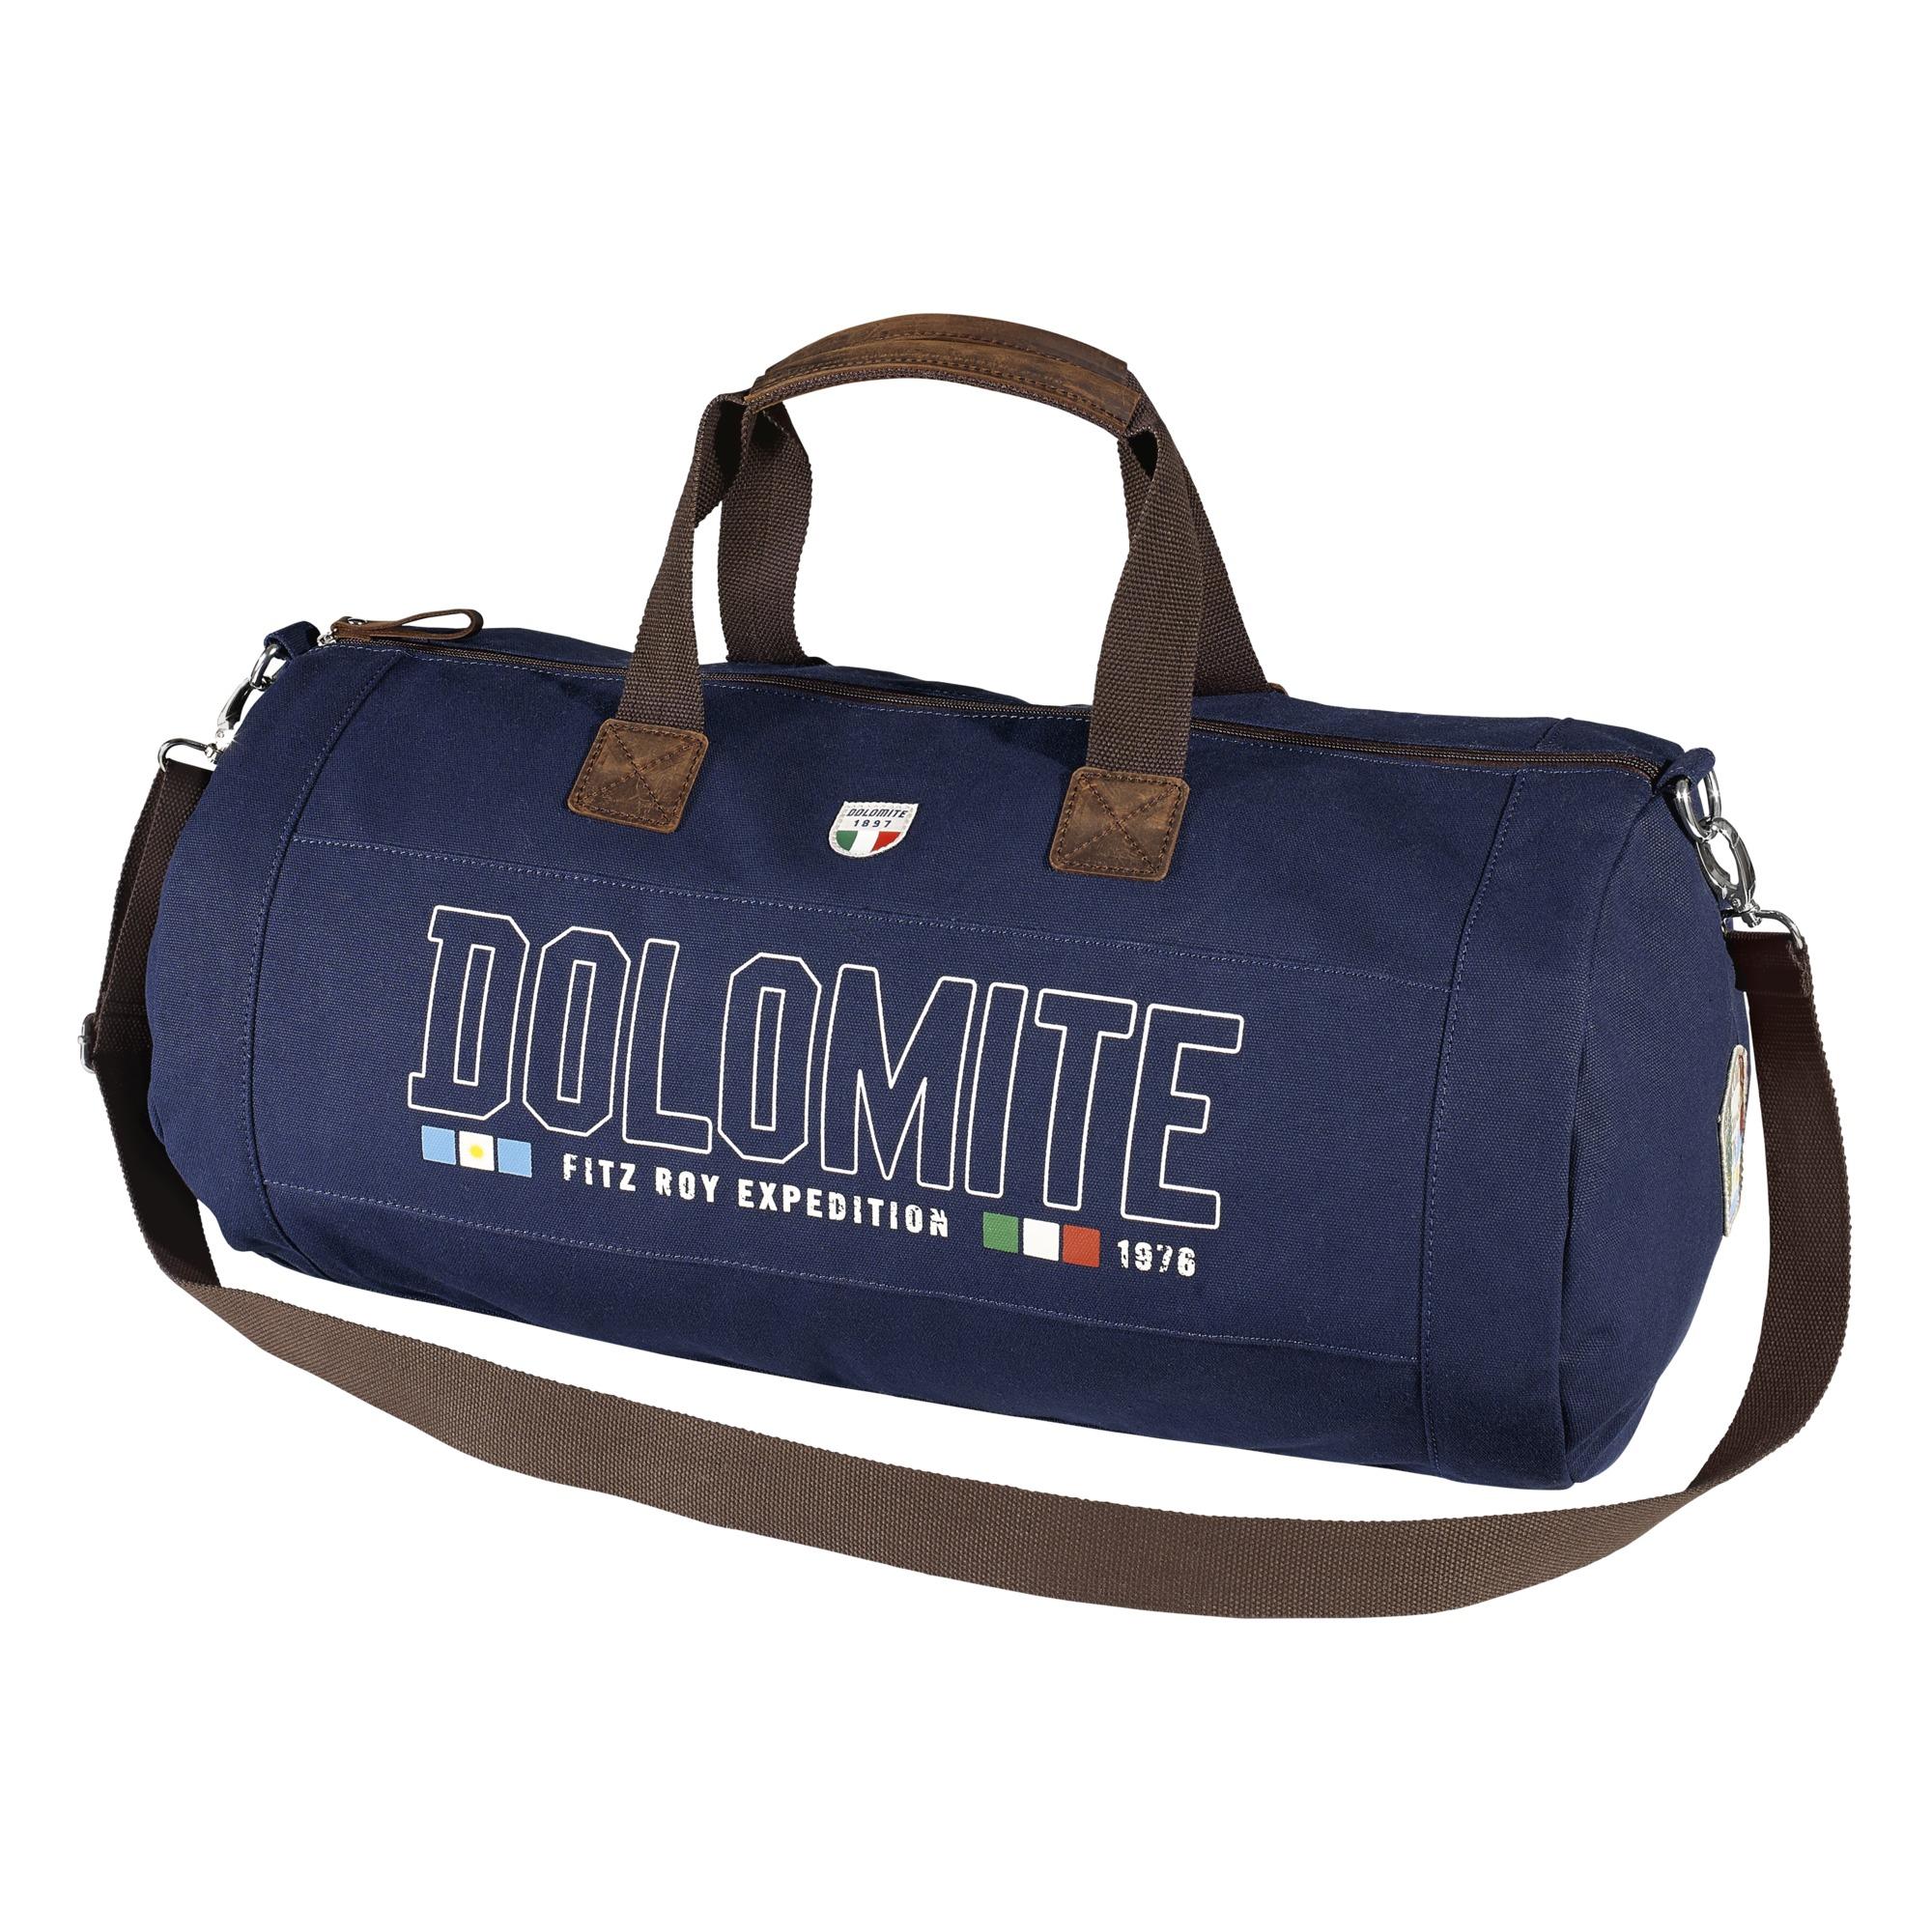 DOLOMITE 60 Canvas Duffle Bag